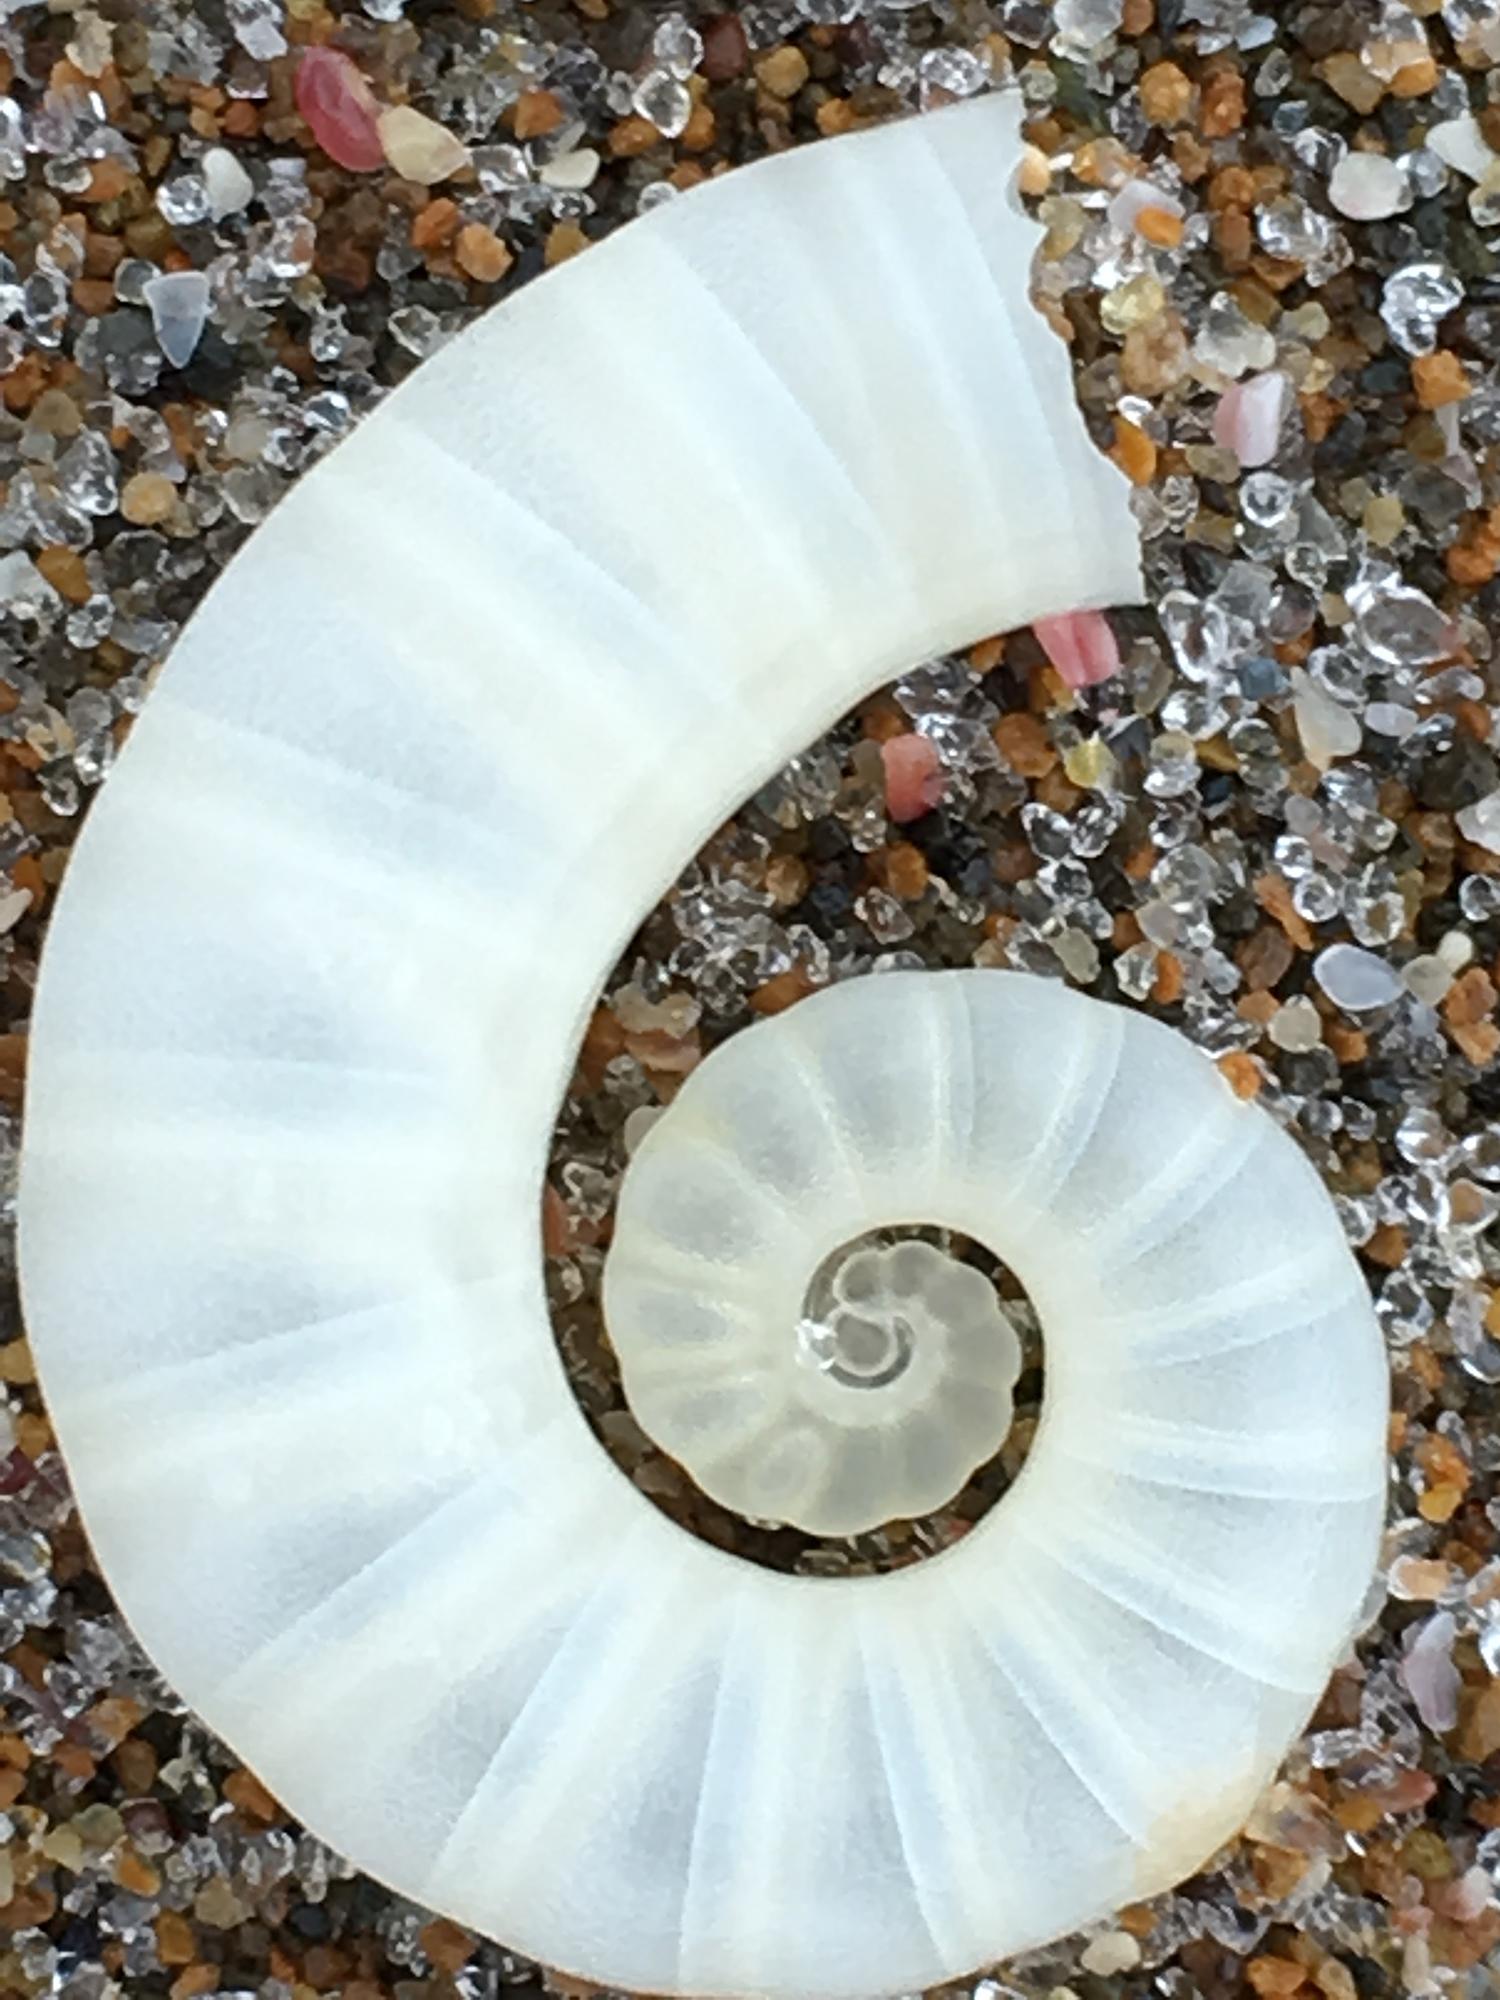 Shoreline Treasures - Soul-filling eye-candy.